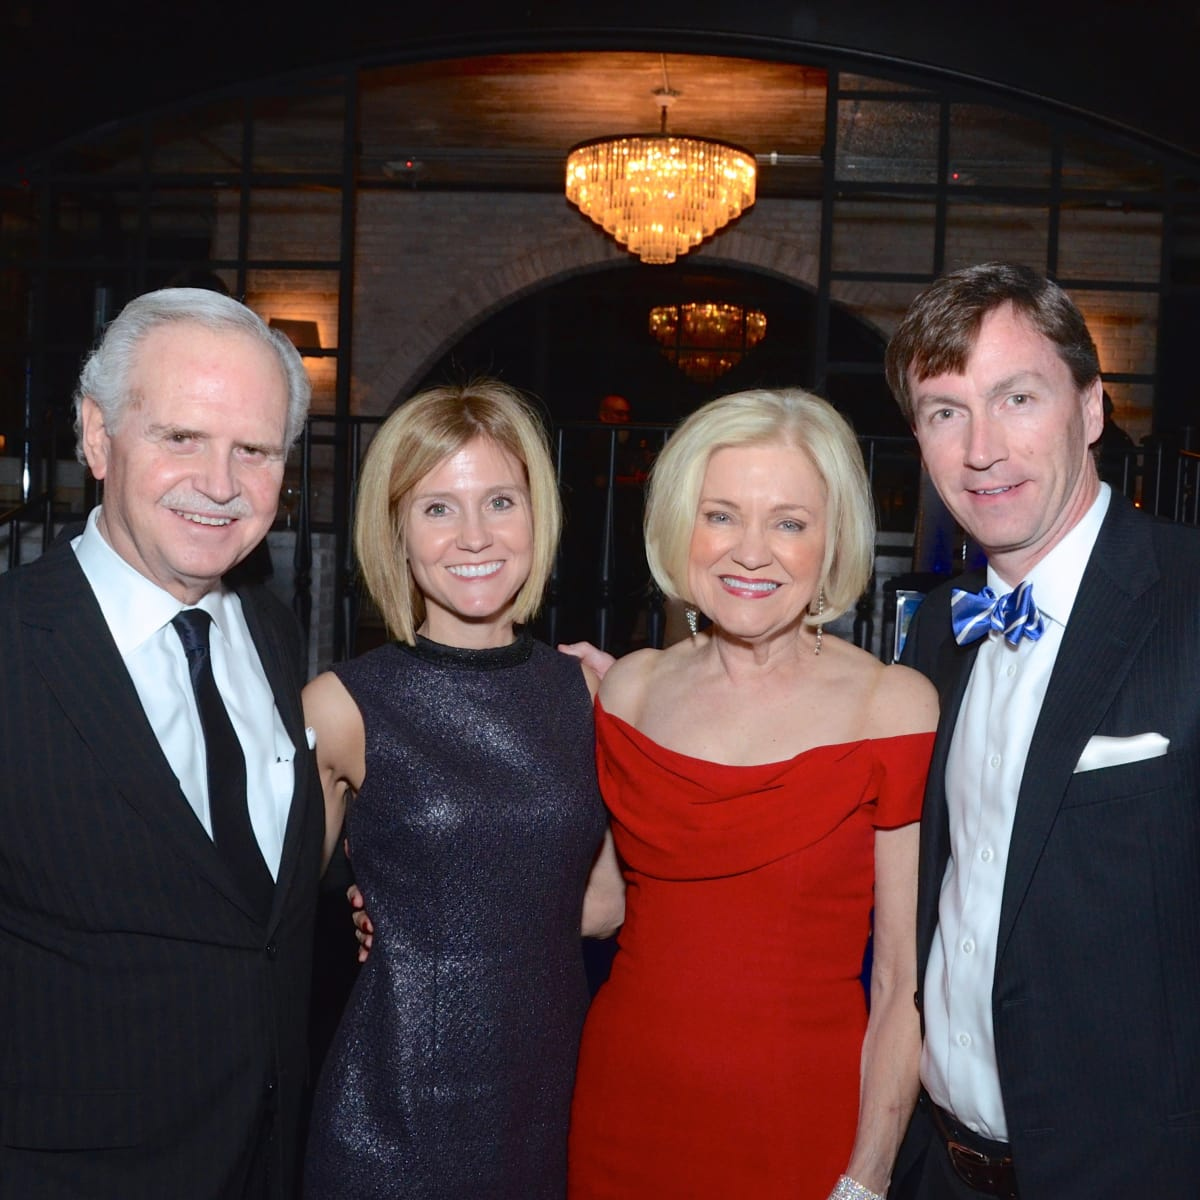 Underwriting Chairman Jim Furr, Erin Stimming, Underwriting Chairman Jo Furr, Chris Stimming at Stages Gala